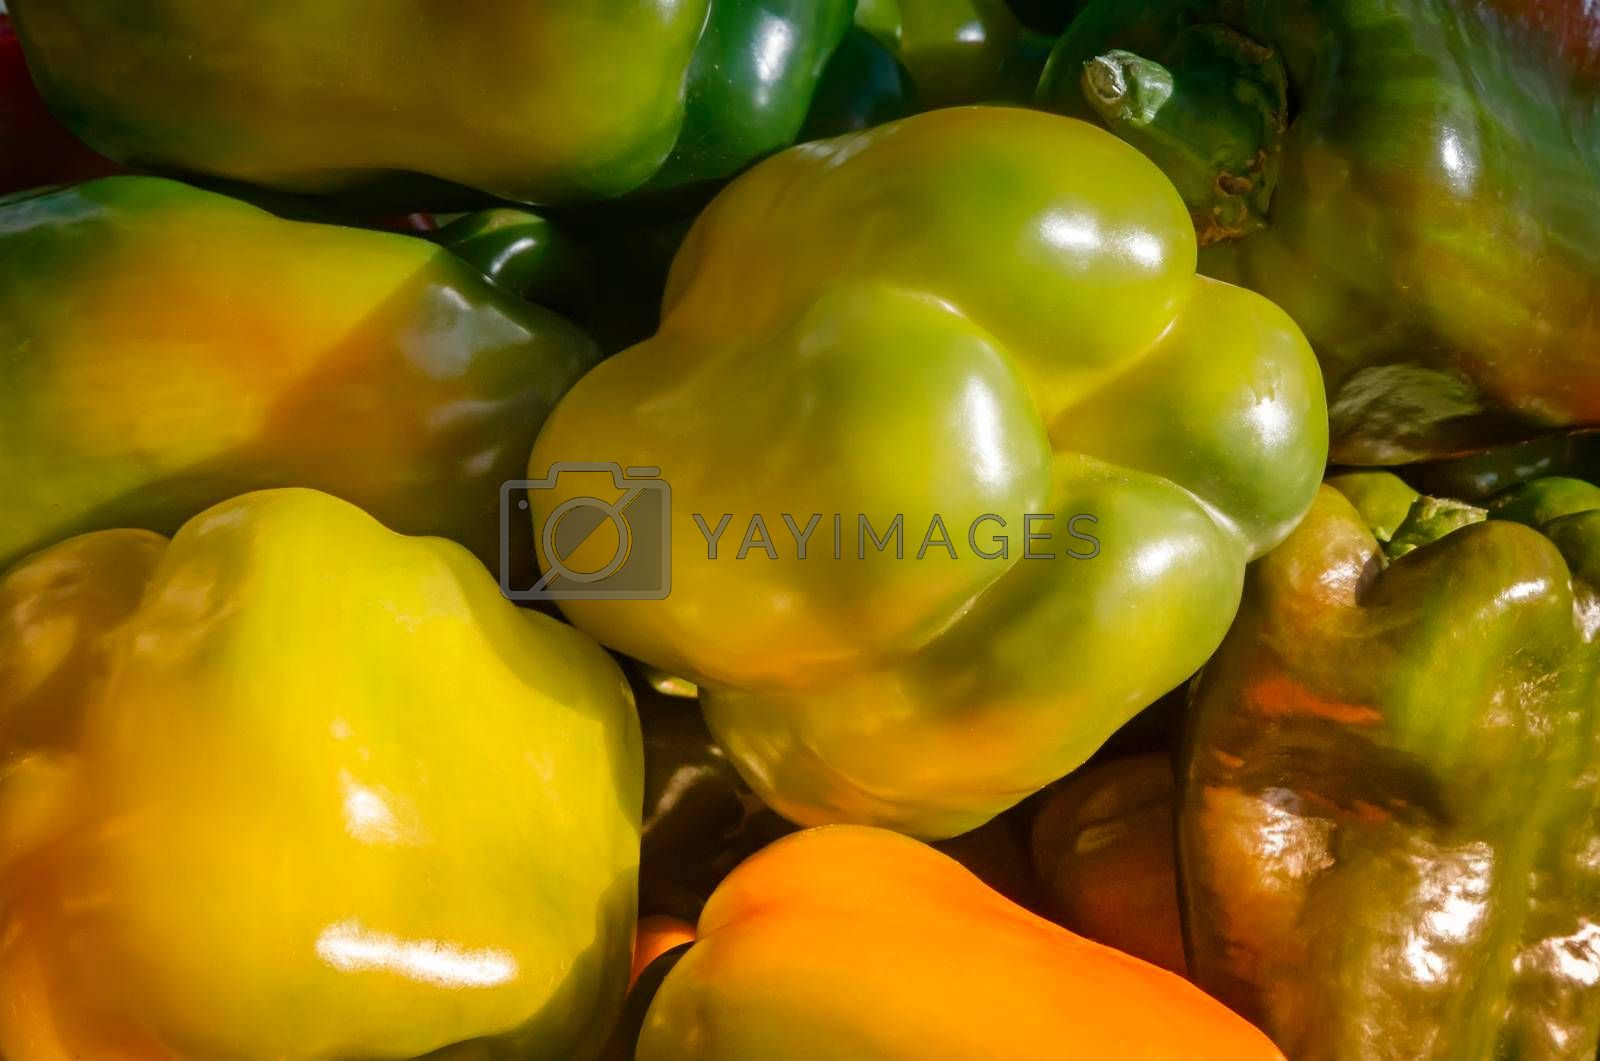 Large fruit ripe yellow pepper. Presents closeup.